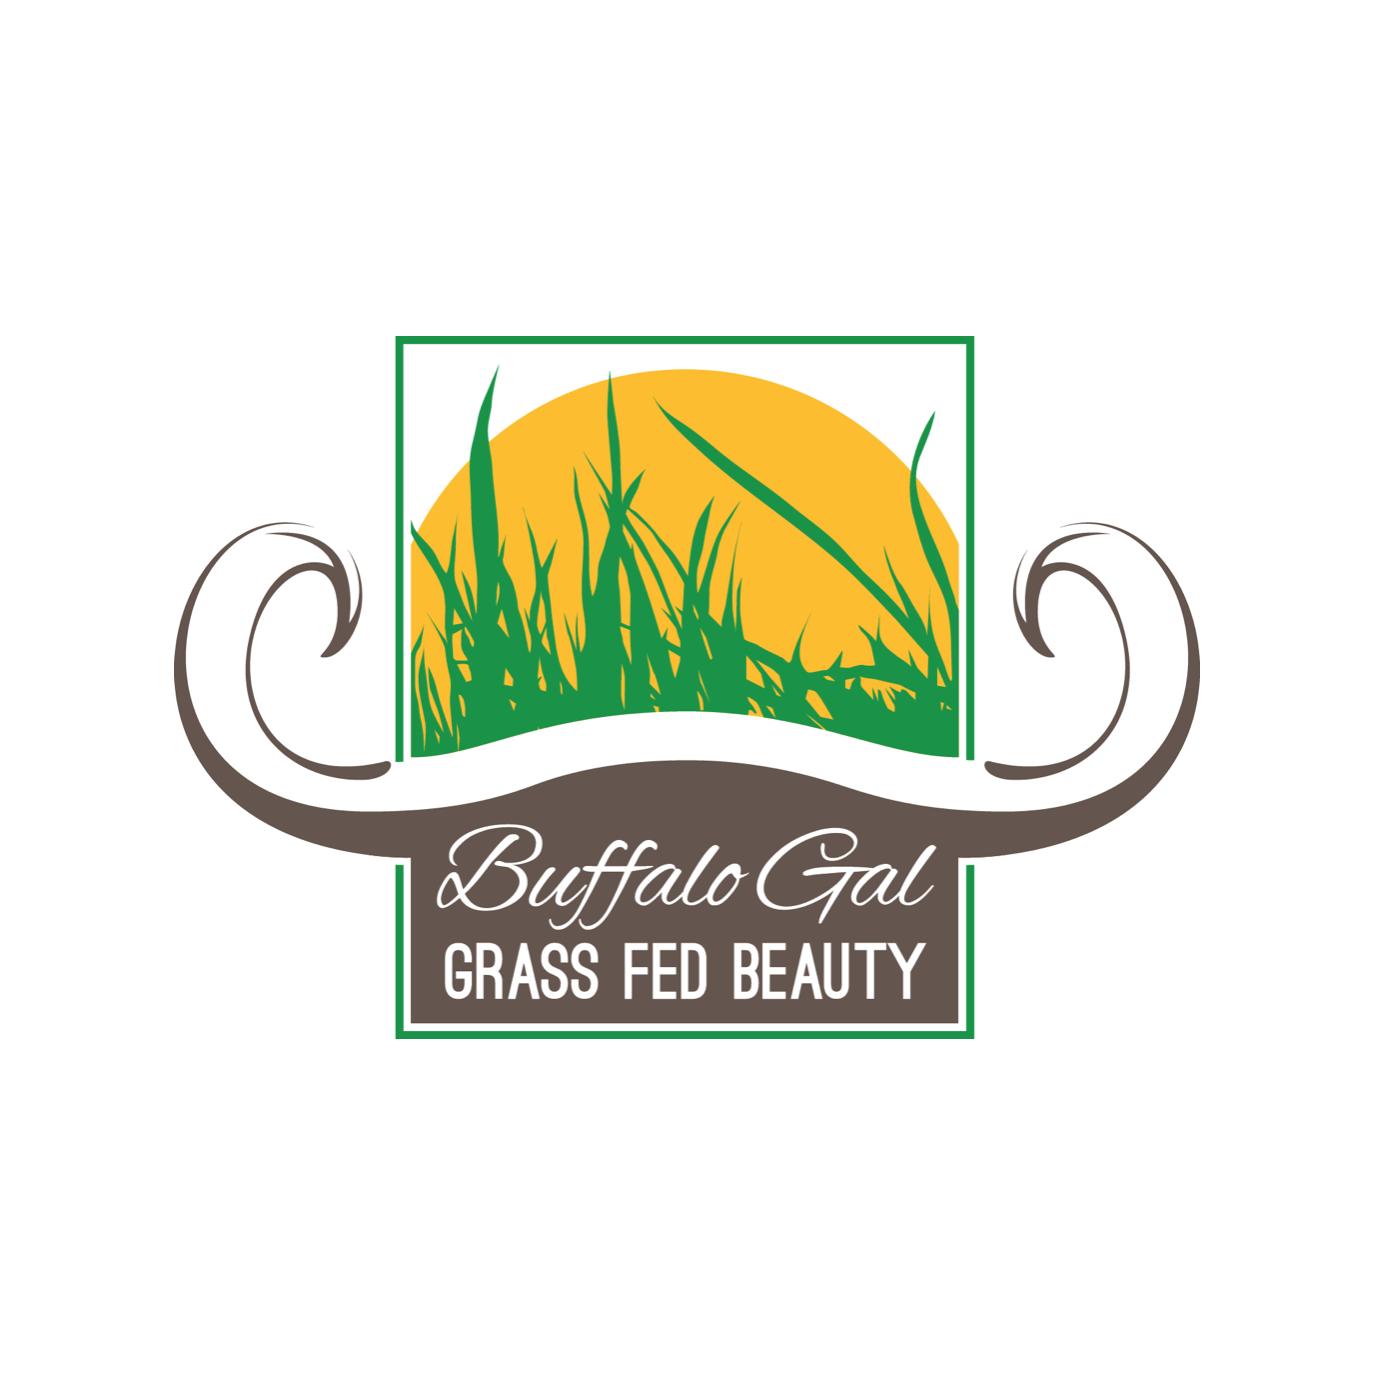 Buffalo Gal Grassfed Beauty logo - Certified Paleo - Paleo Foundation